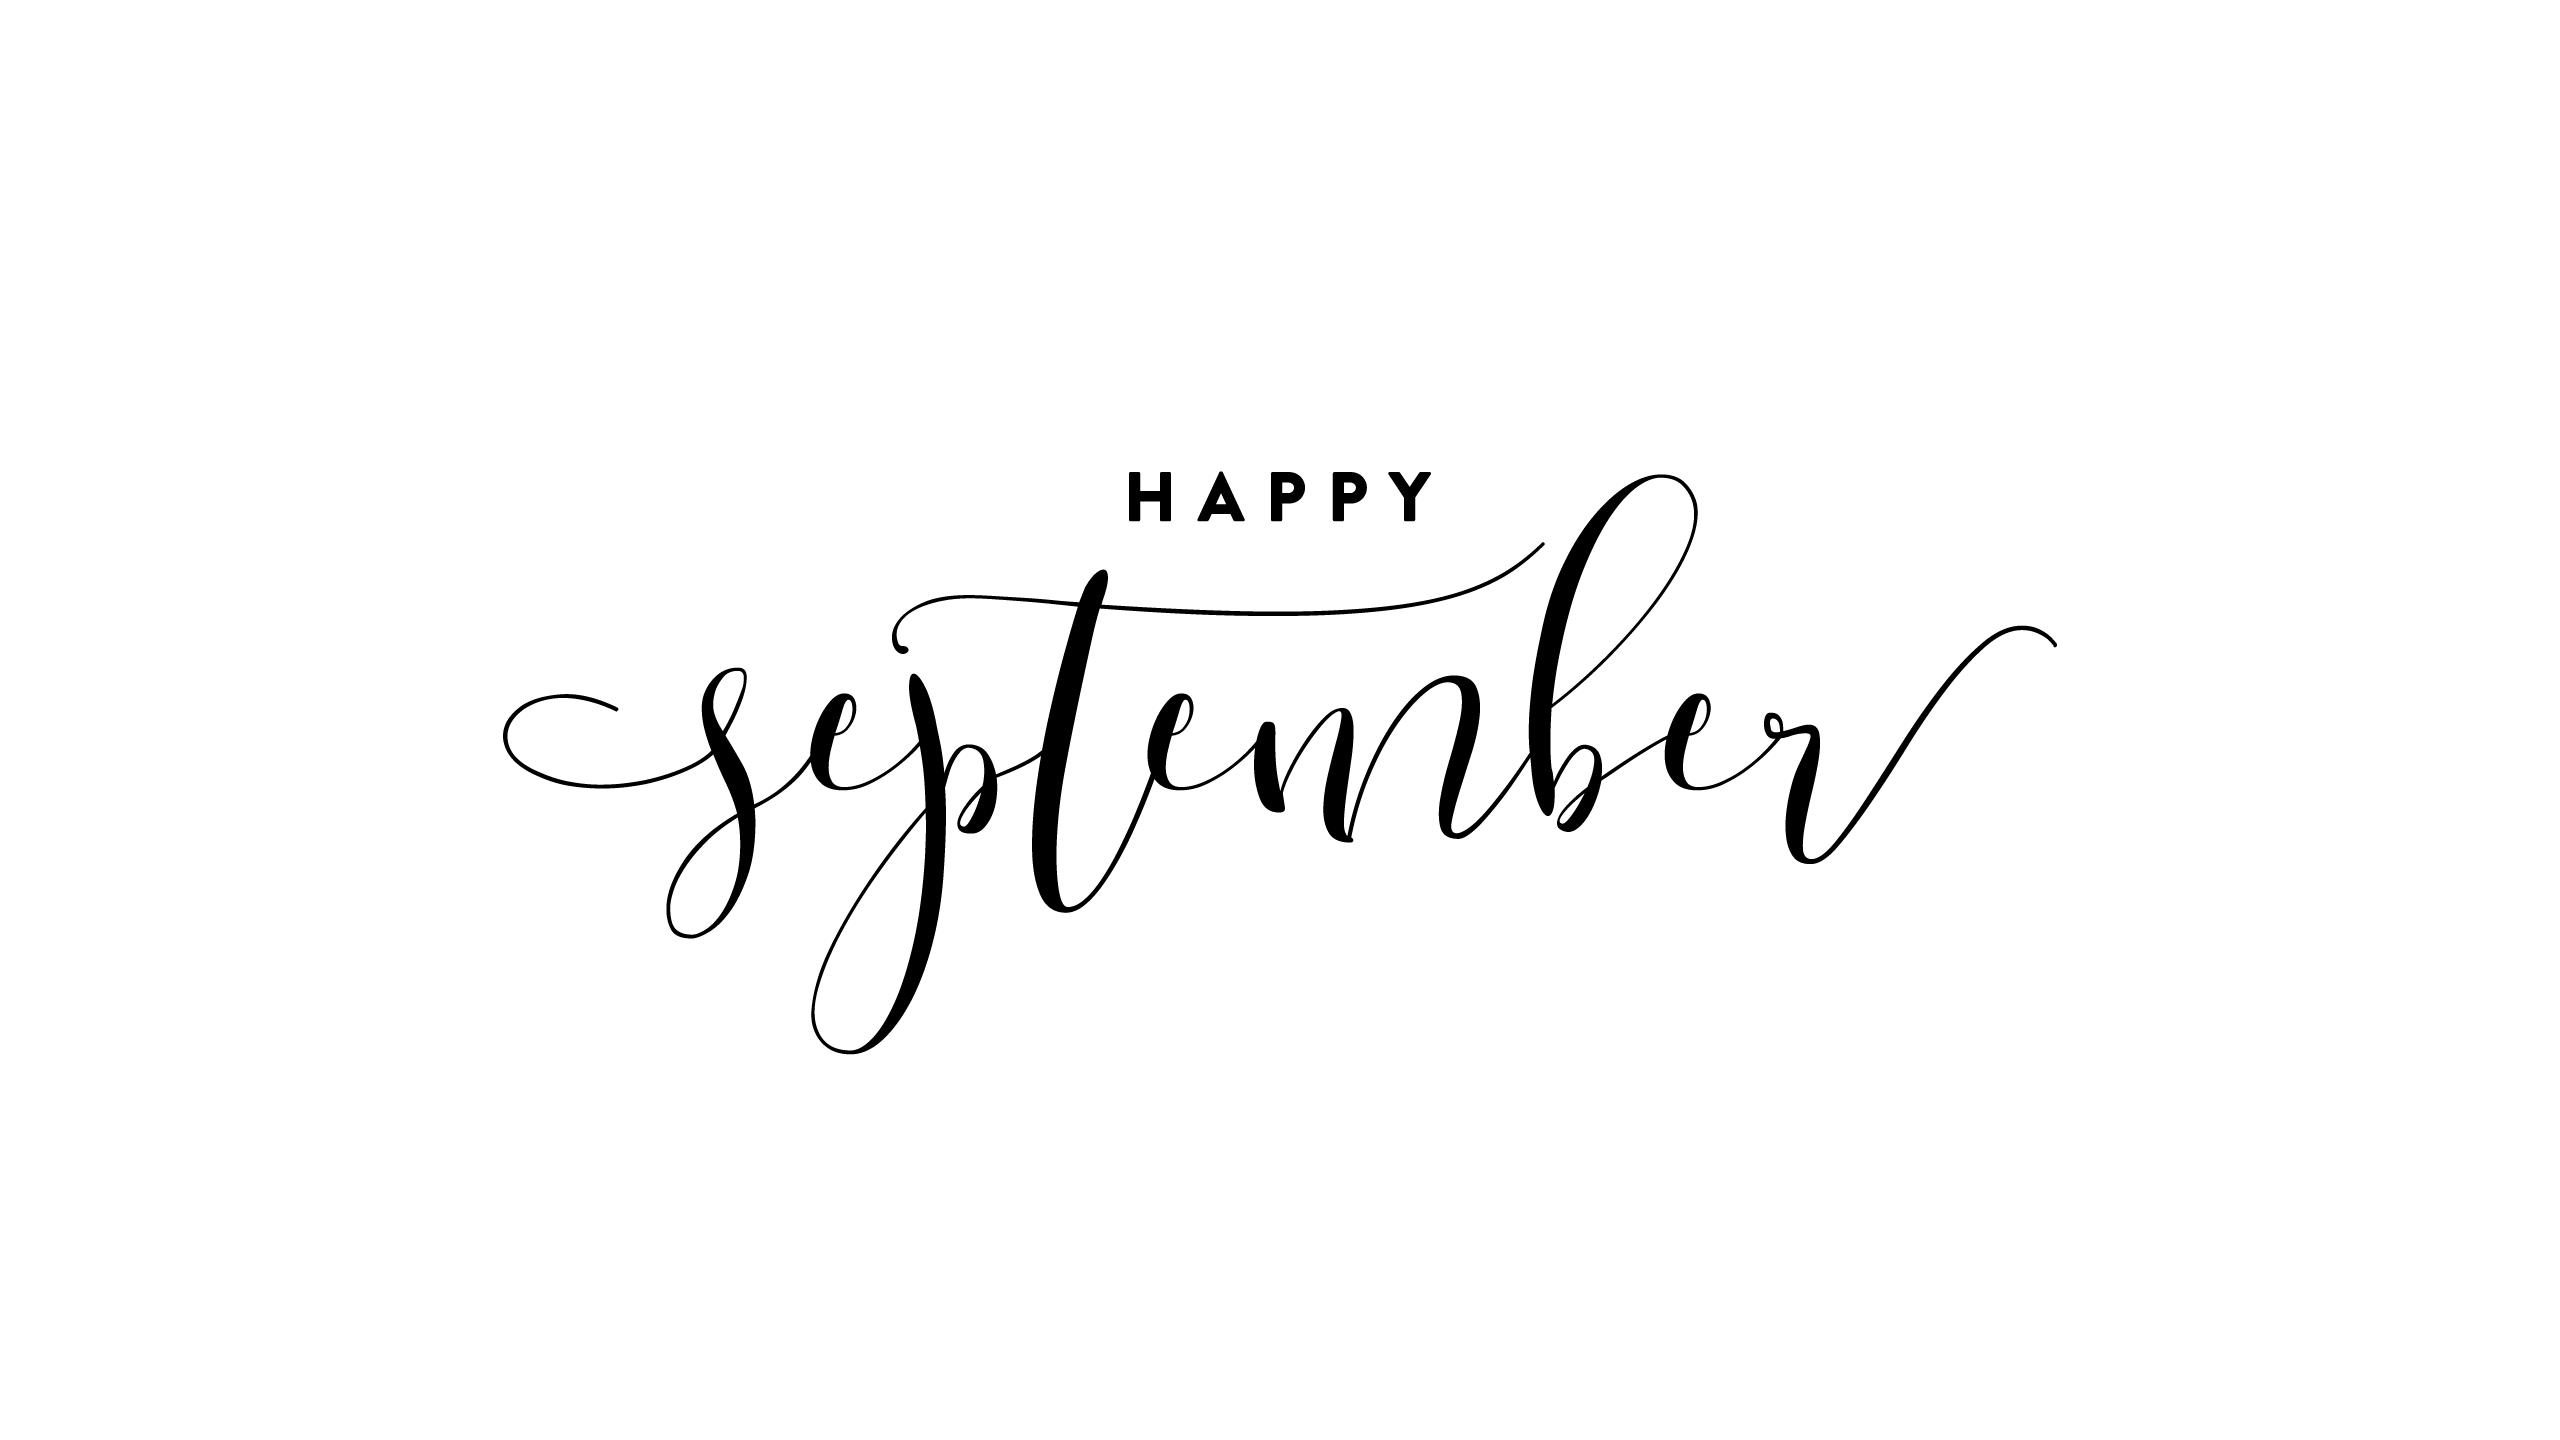 September Computer Wallpapers Top Free September Computer Backgrounds Wallpaperaccess